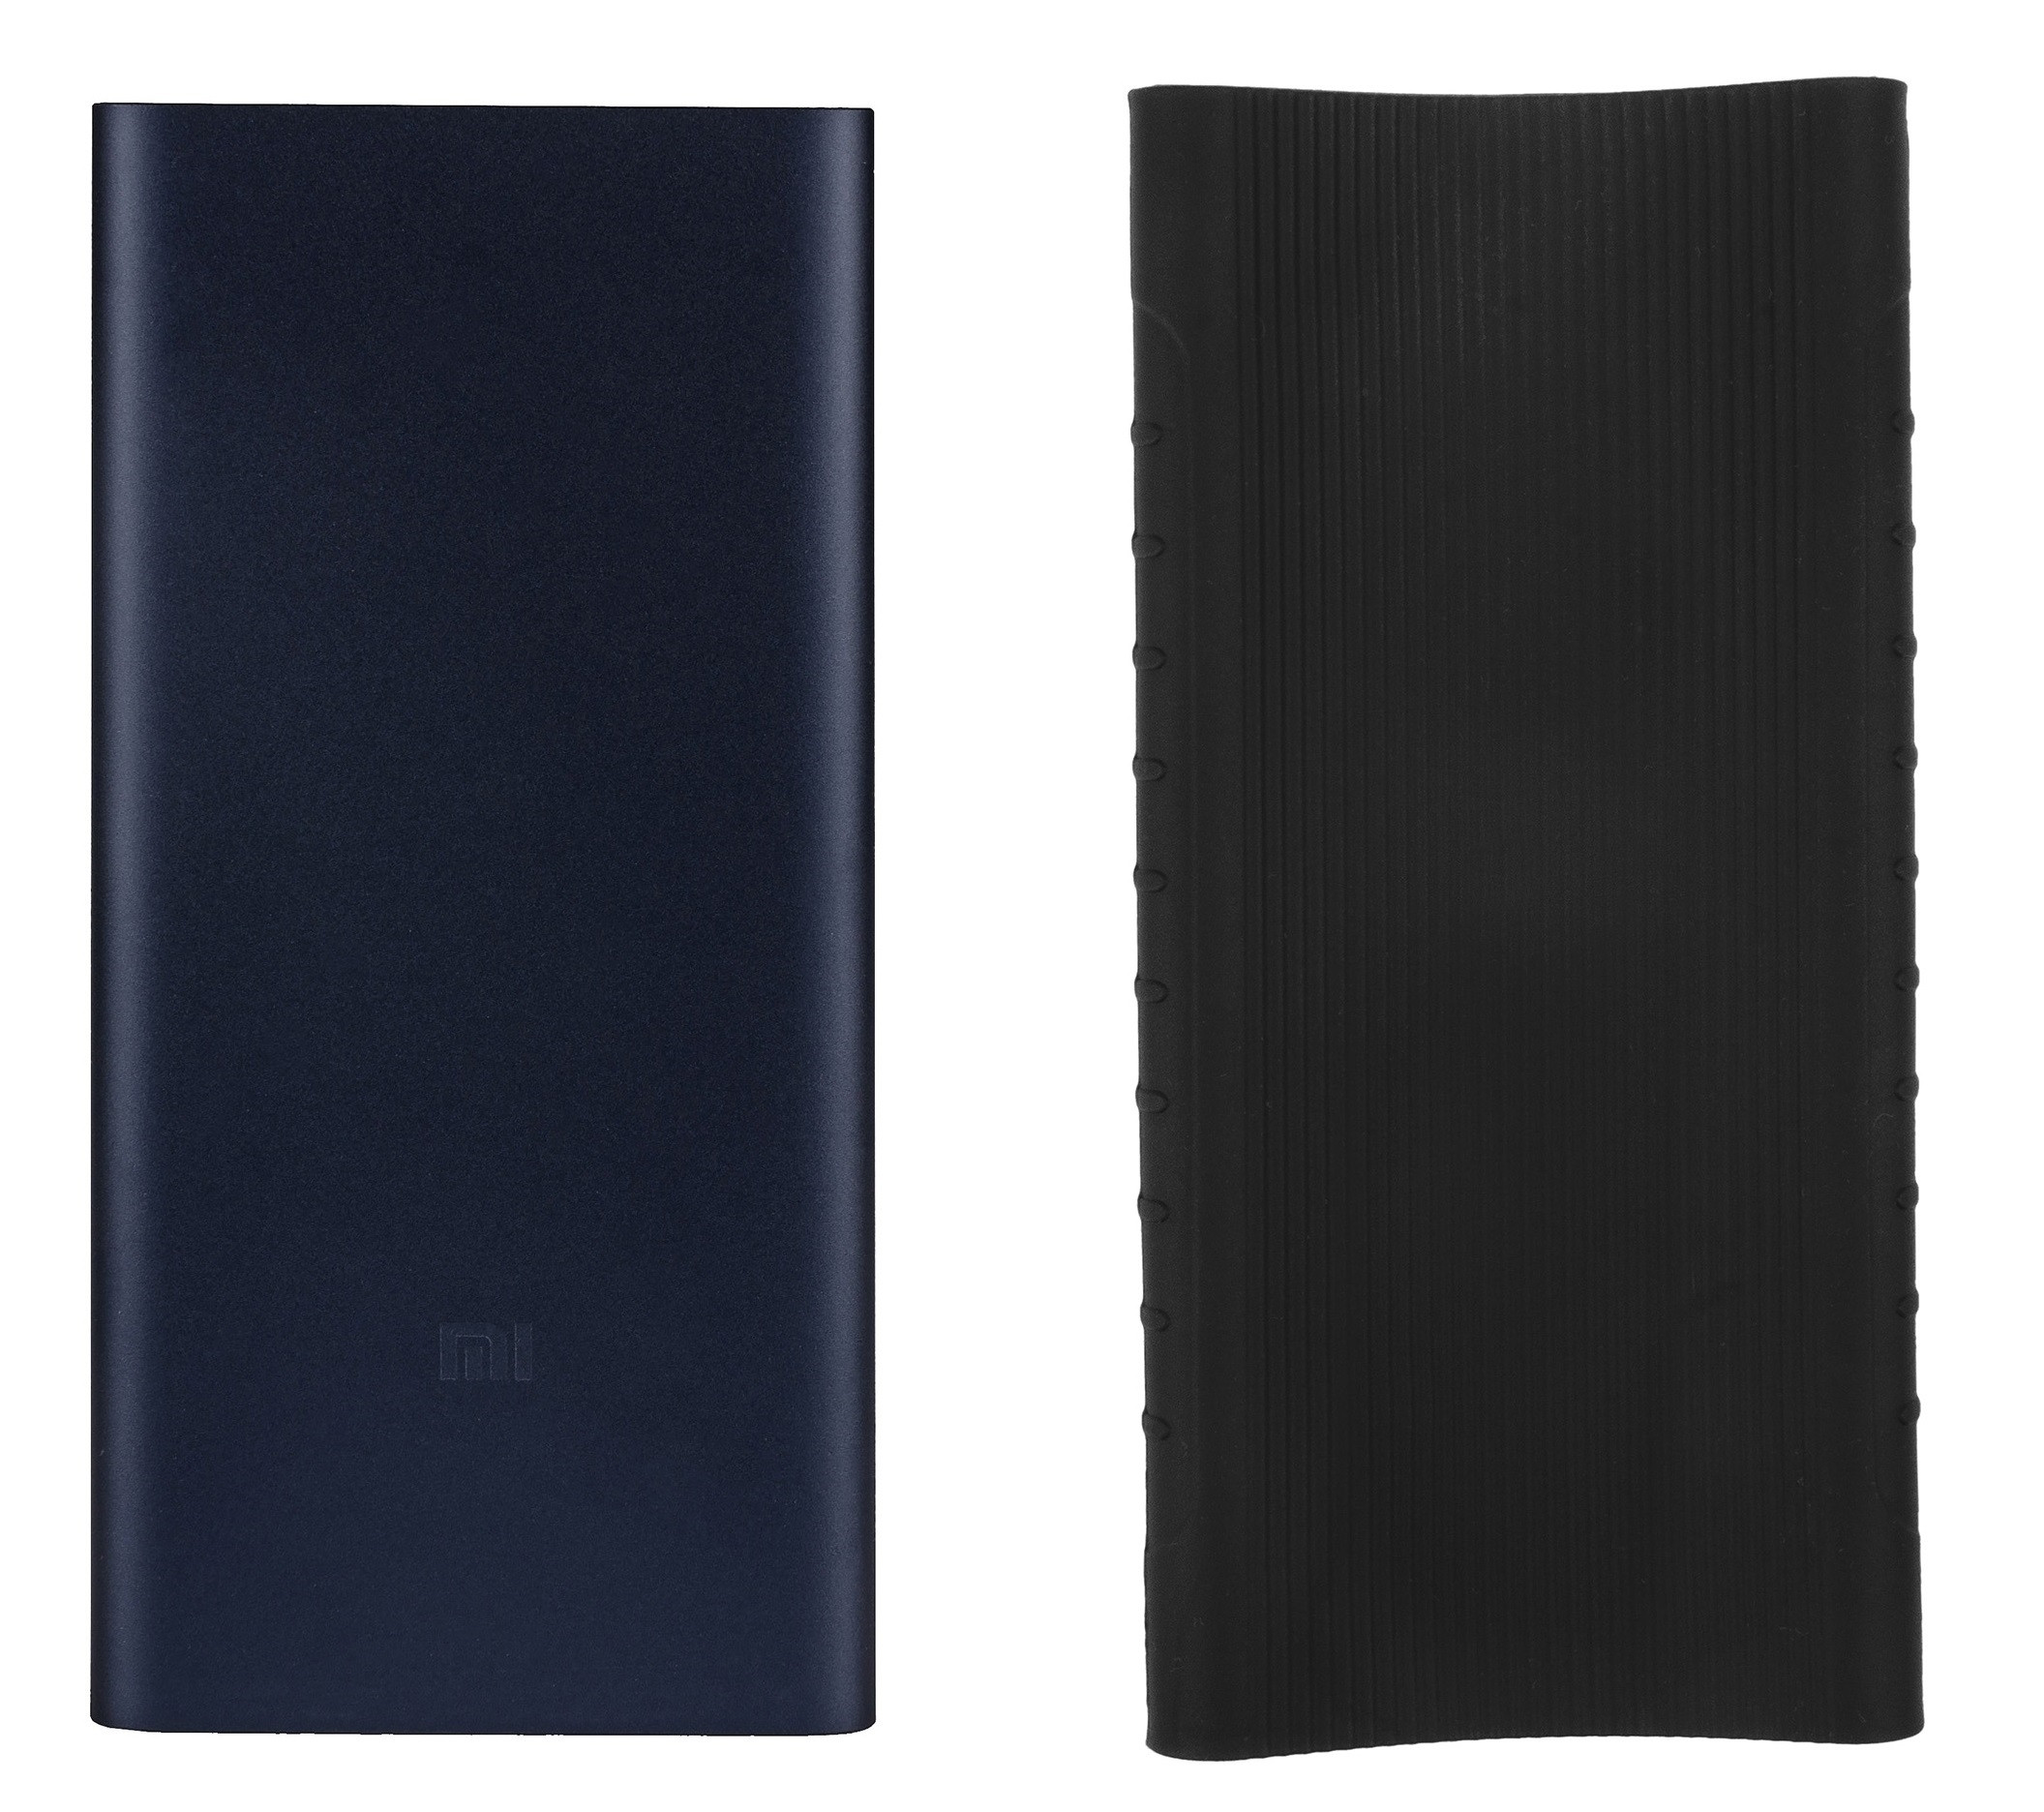 Power Banka Xiaomi Mi 2i 10000mAh Quick Charge 3.0